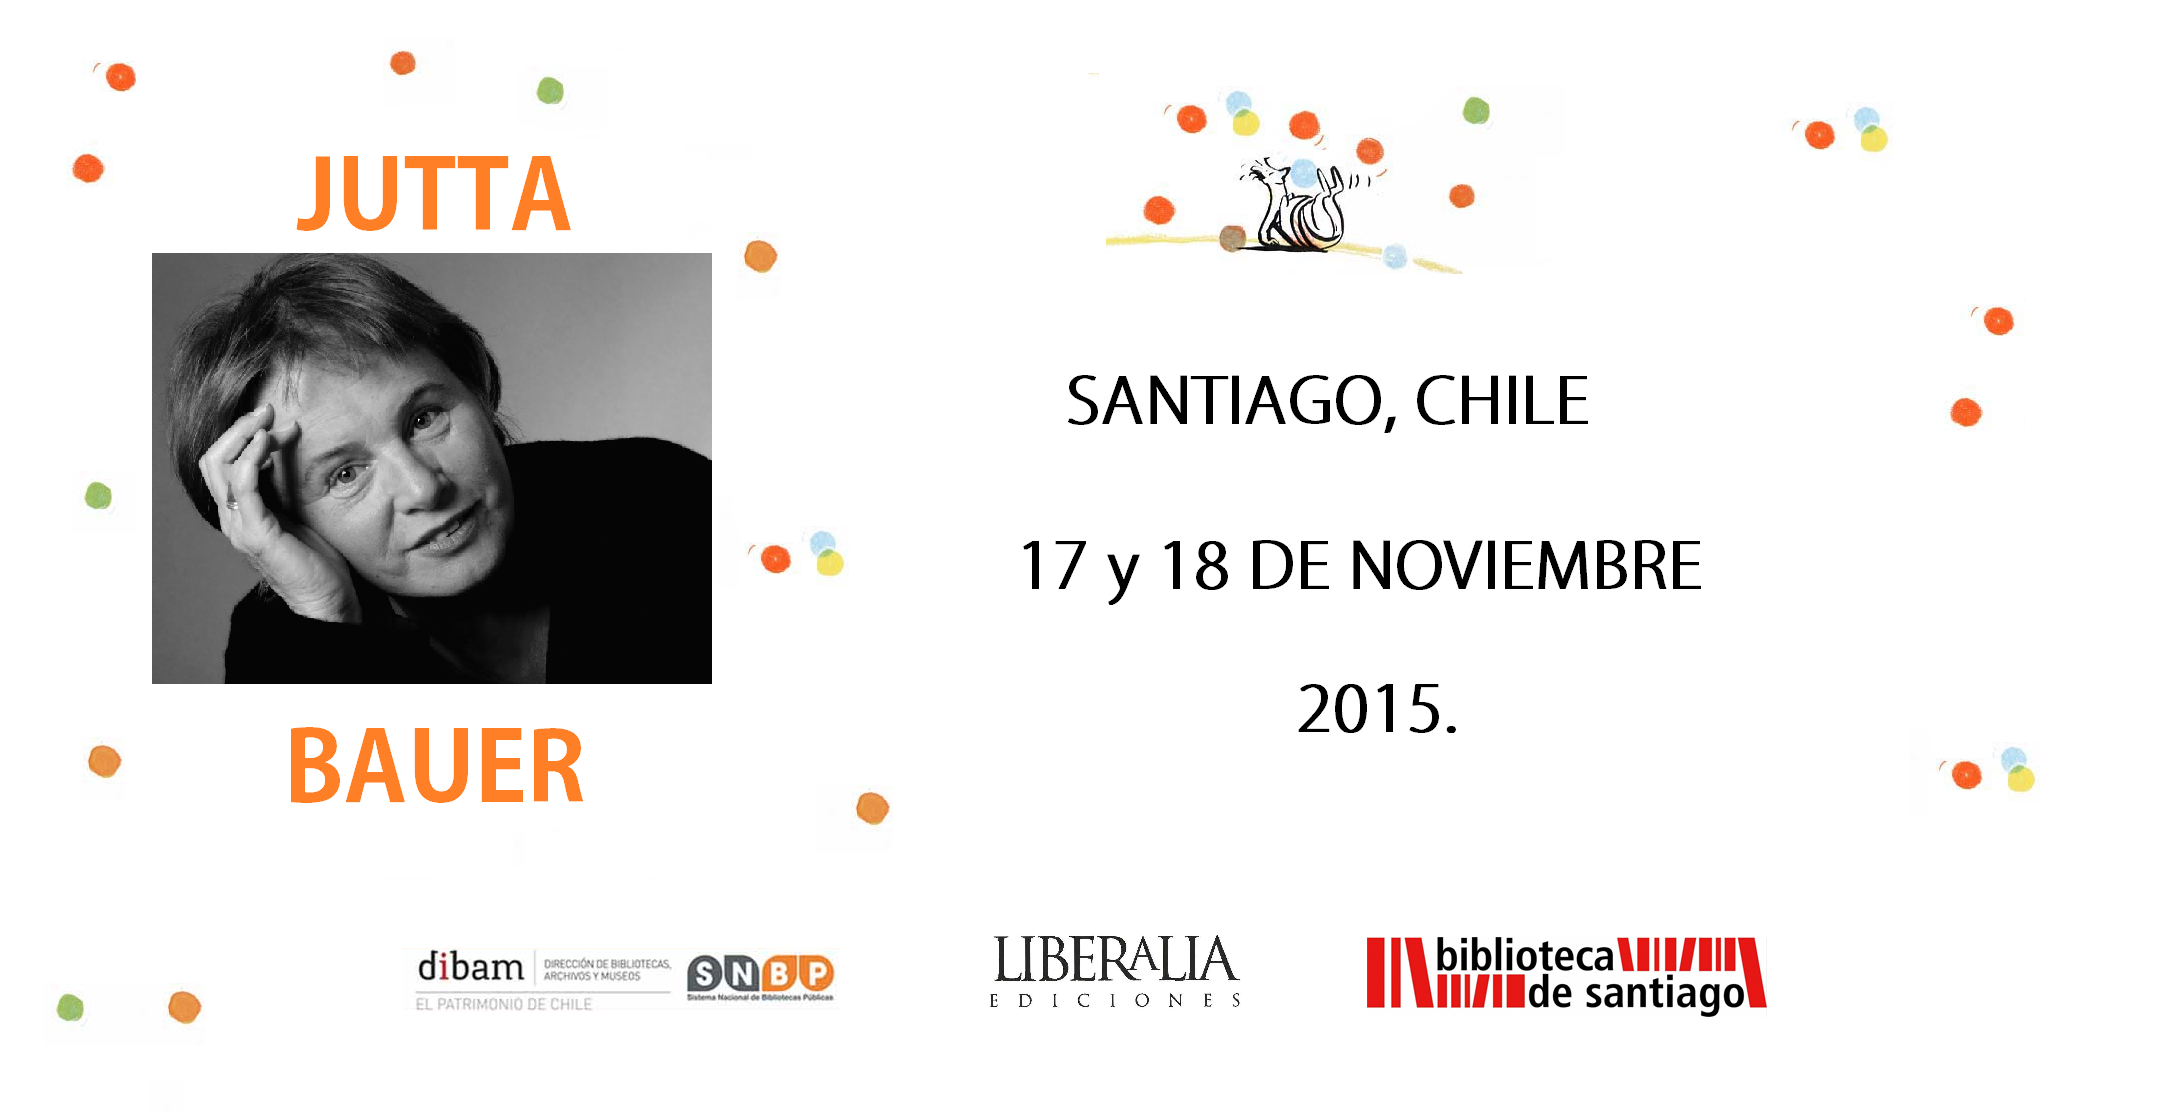 Agenda Jutta Bauer en Chile